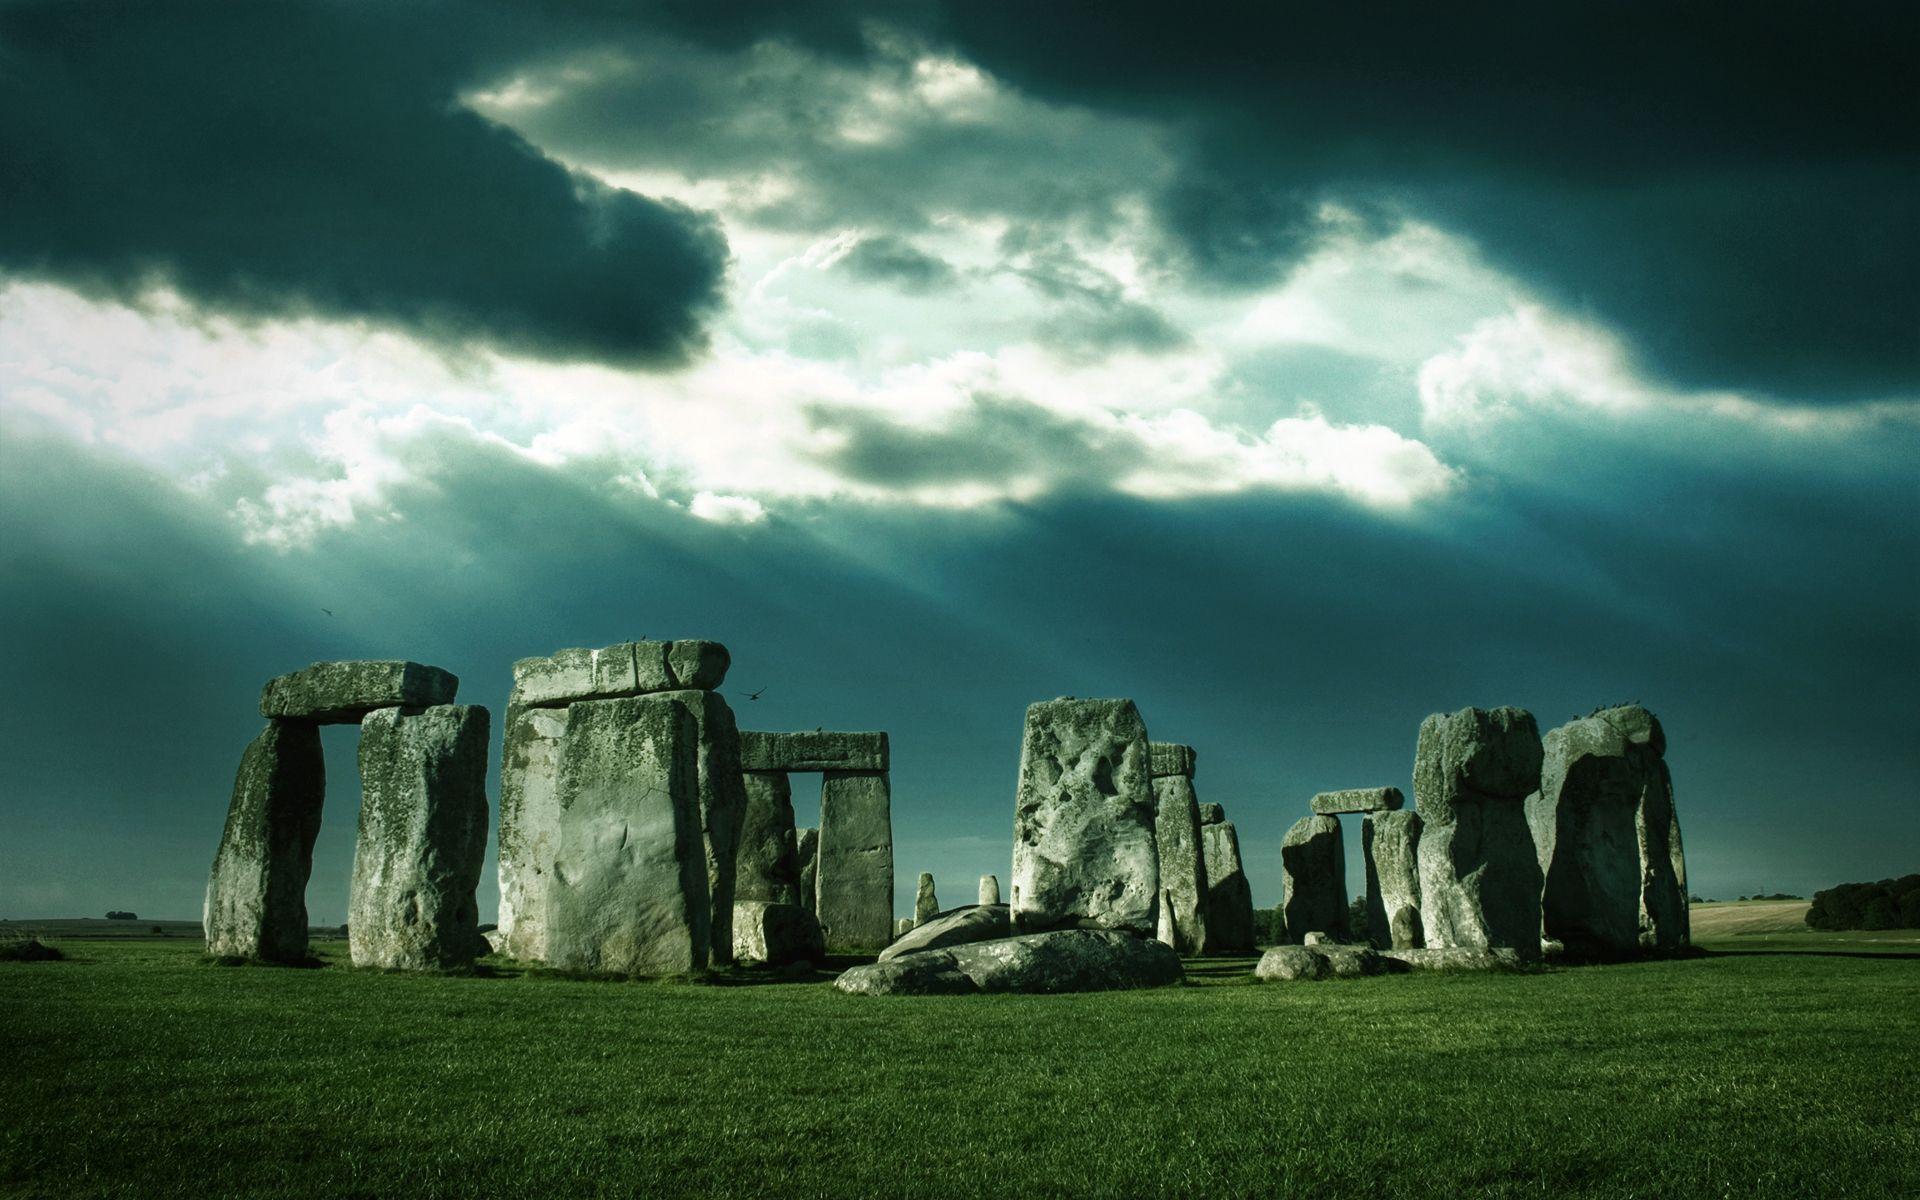 Stonehenge wallpaper 1920x1200 71812 1920x1200